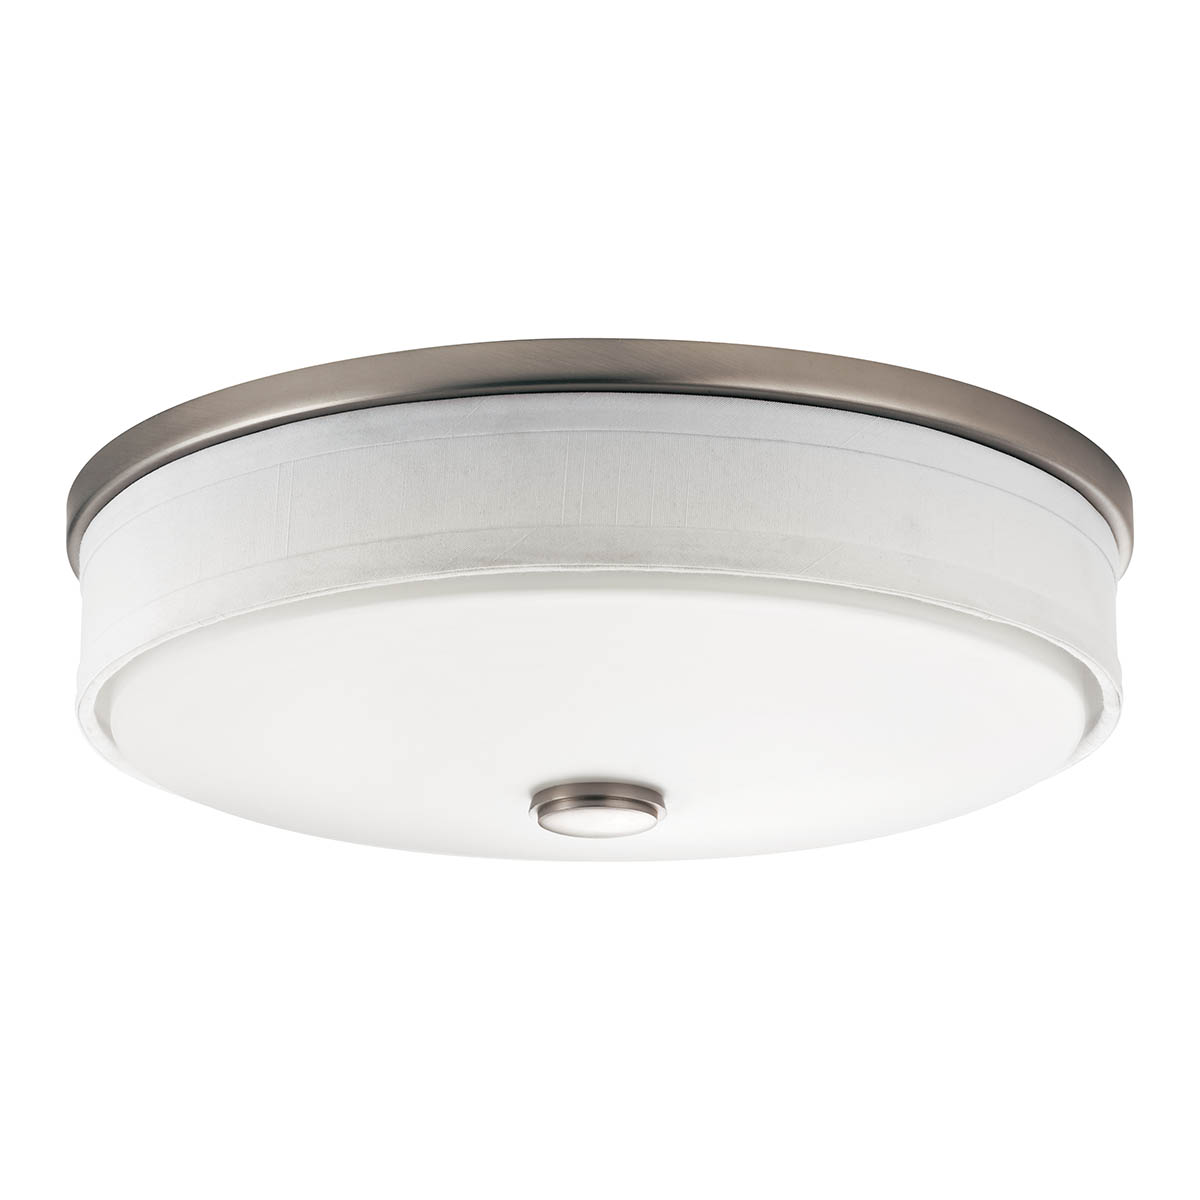 Flush Mount LED